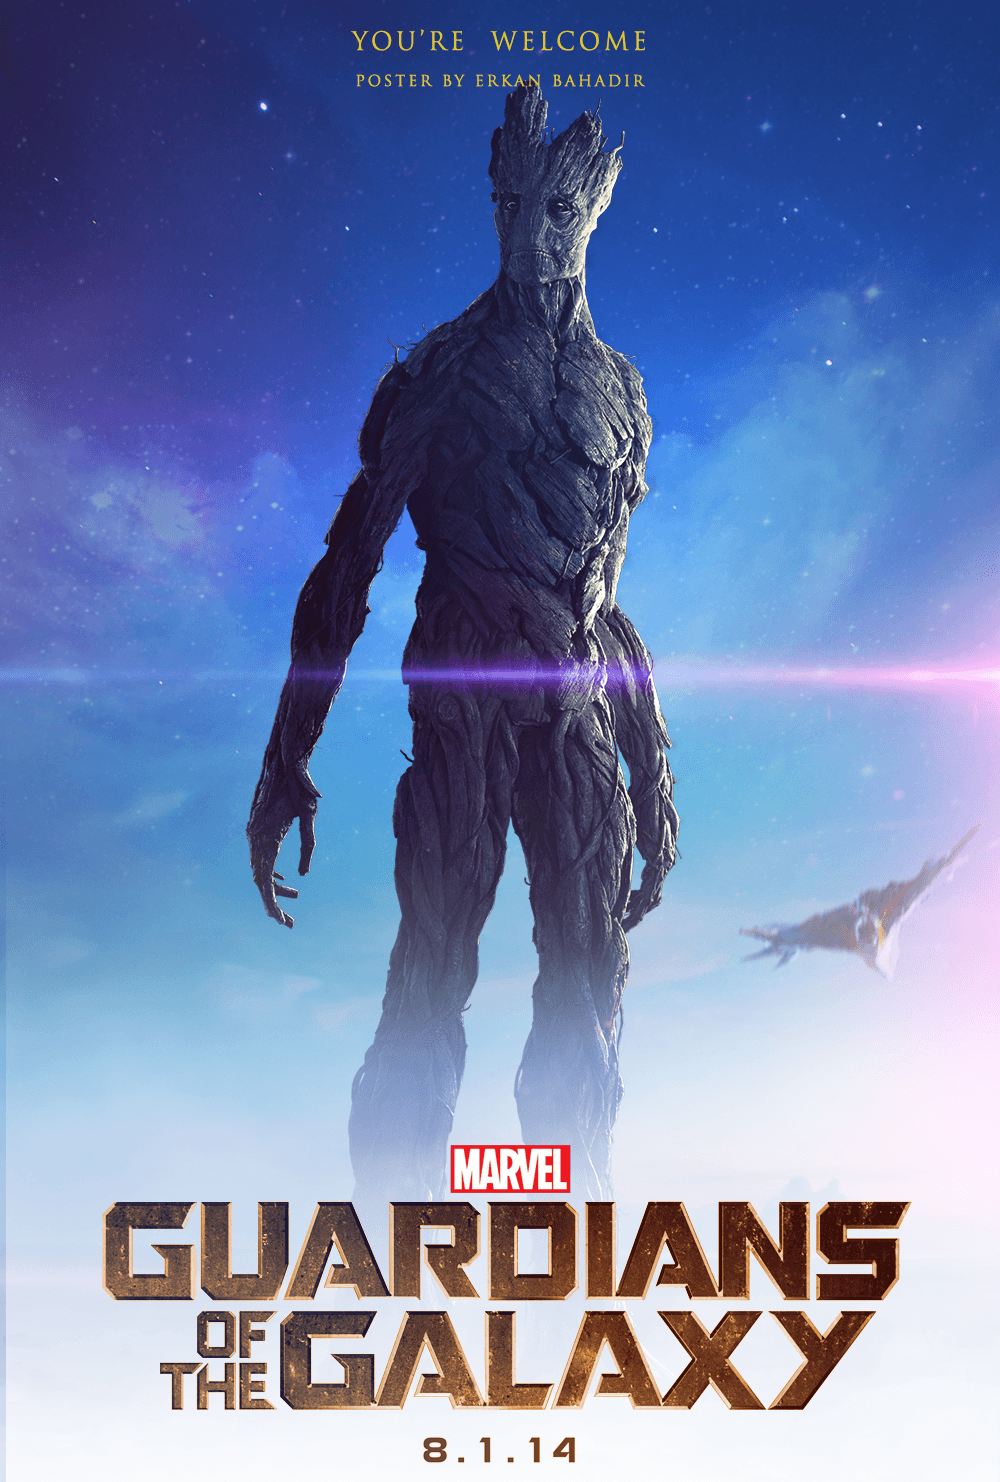 Guardians of the Galaxy: Groot Poster by erkanbahadir23 on DeviantArt